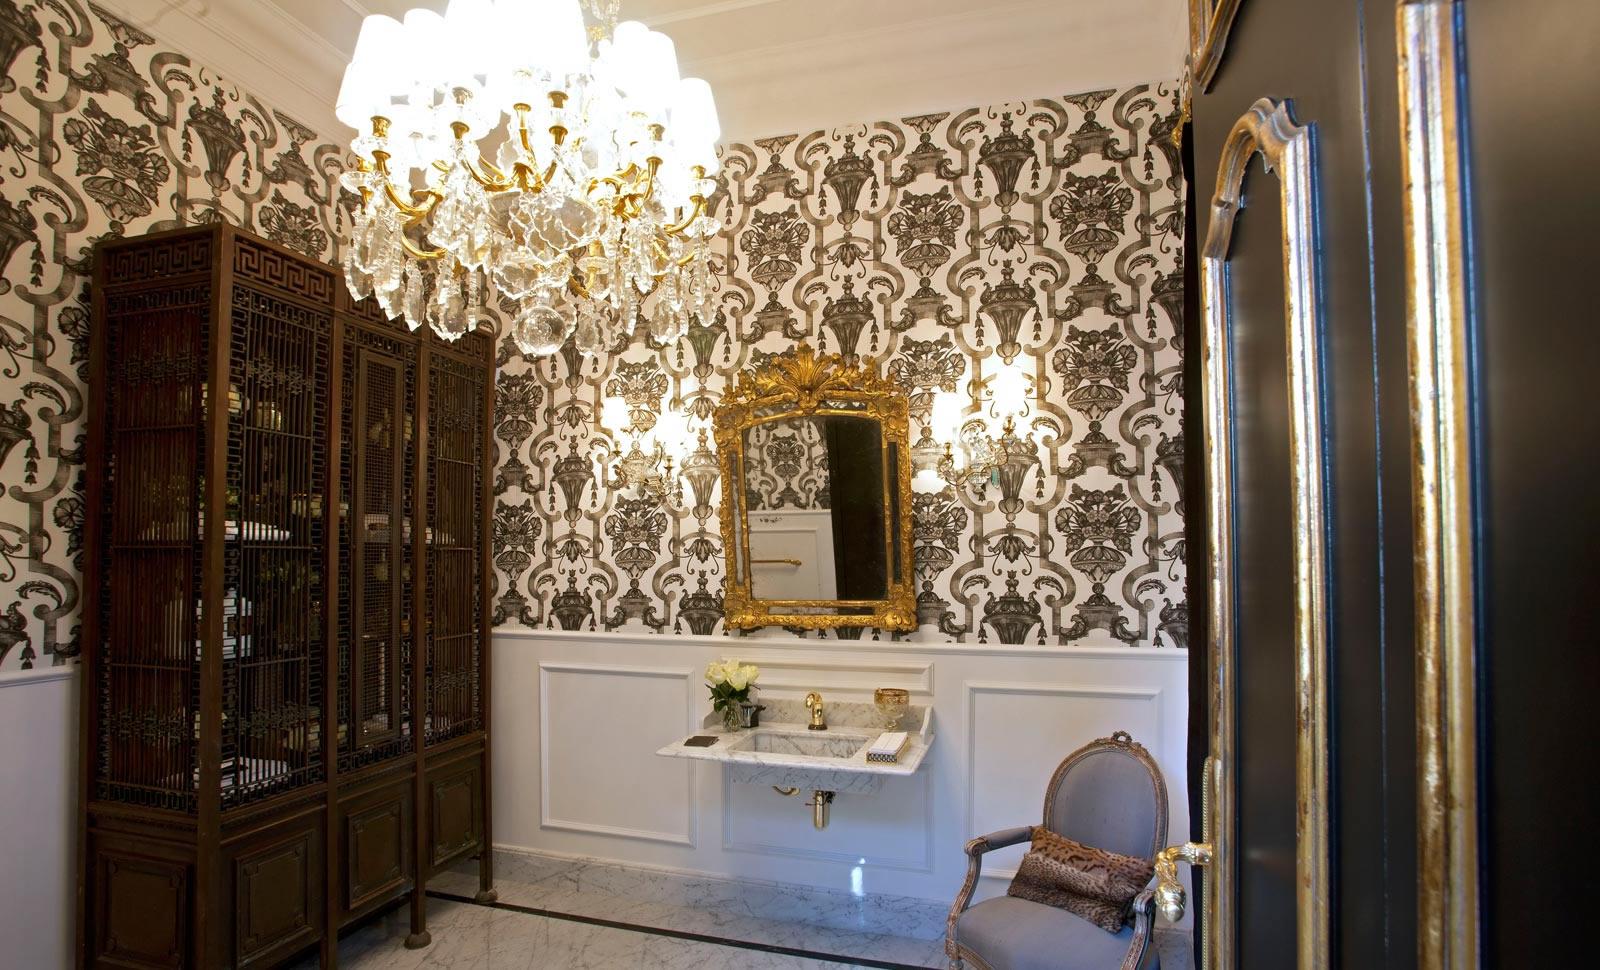 Decoração retrô caracteriza lavabo de Renata Seripieri - Cleon Gostinski